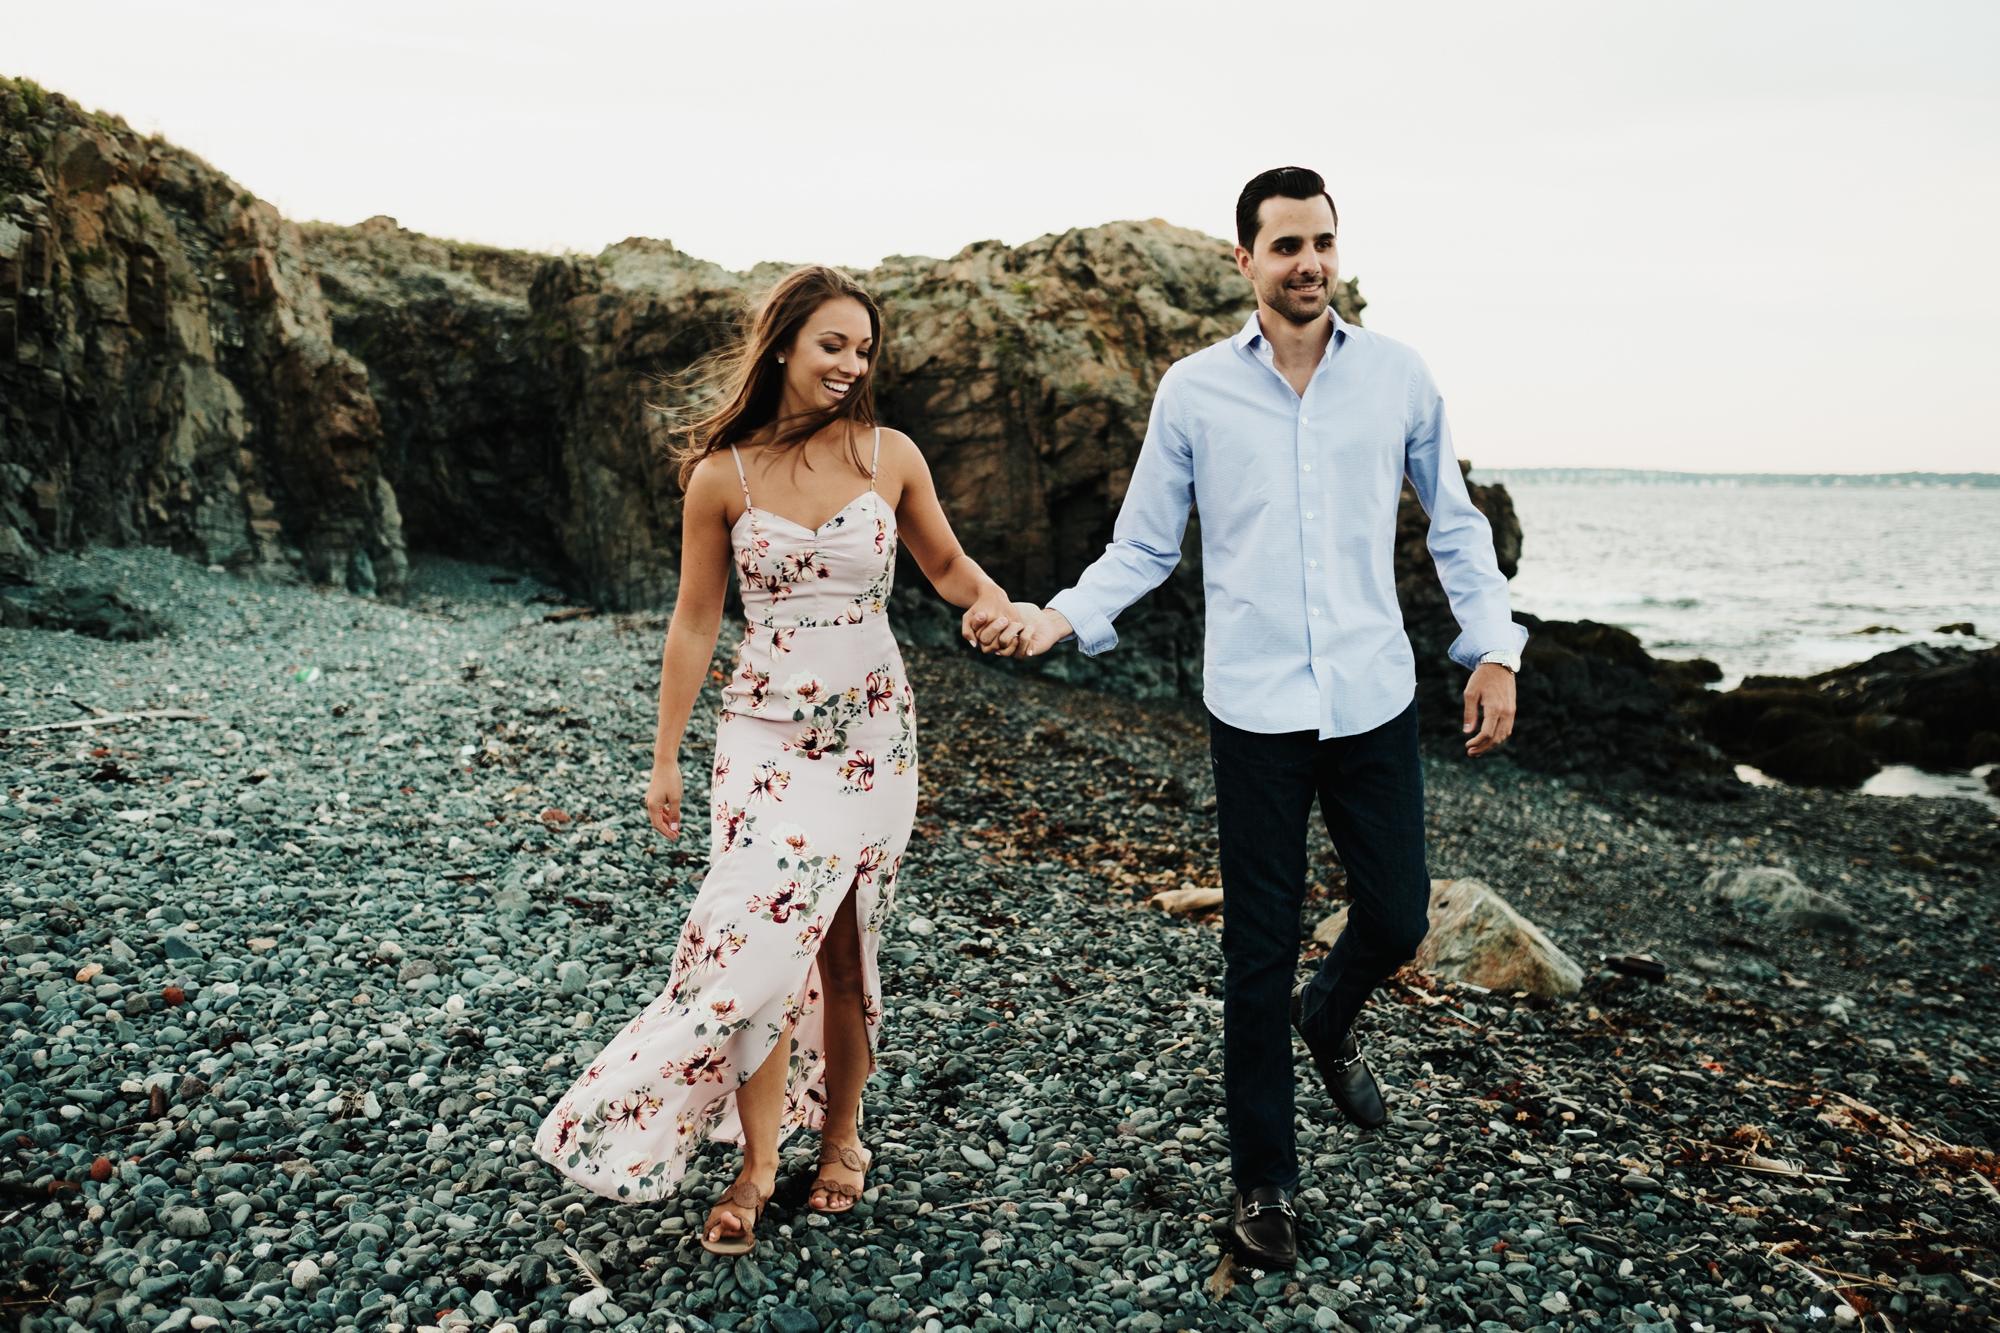 Wedding_Francis_Boucher_Engagement_Nahant_MA_2018-21.jpg